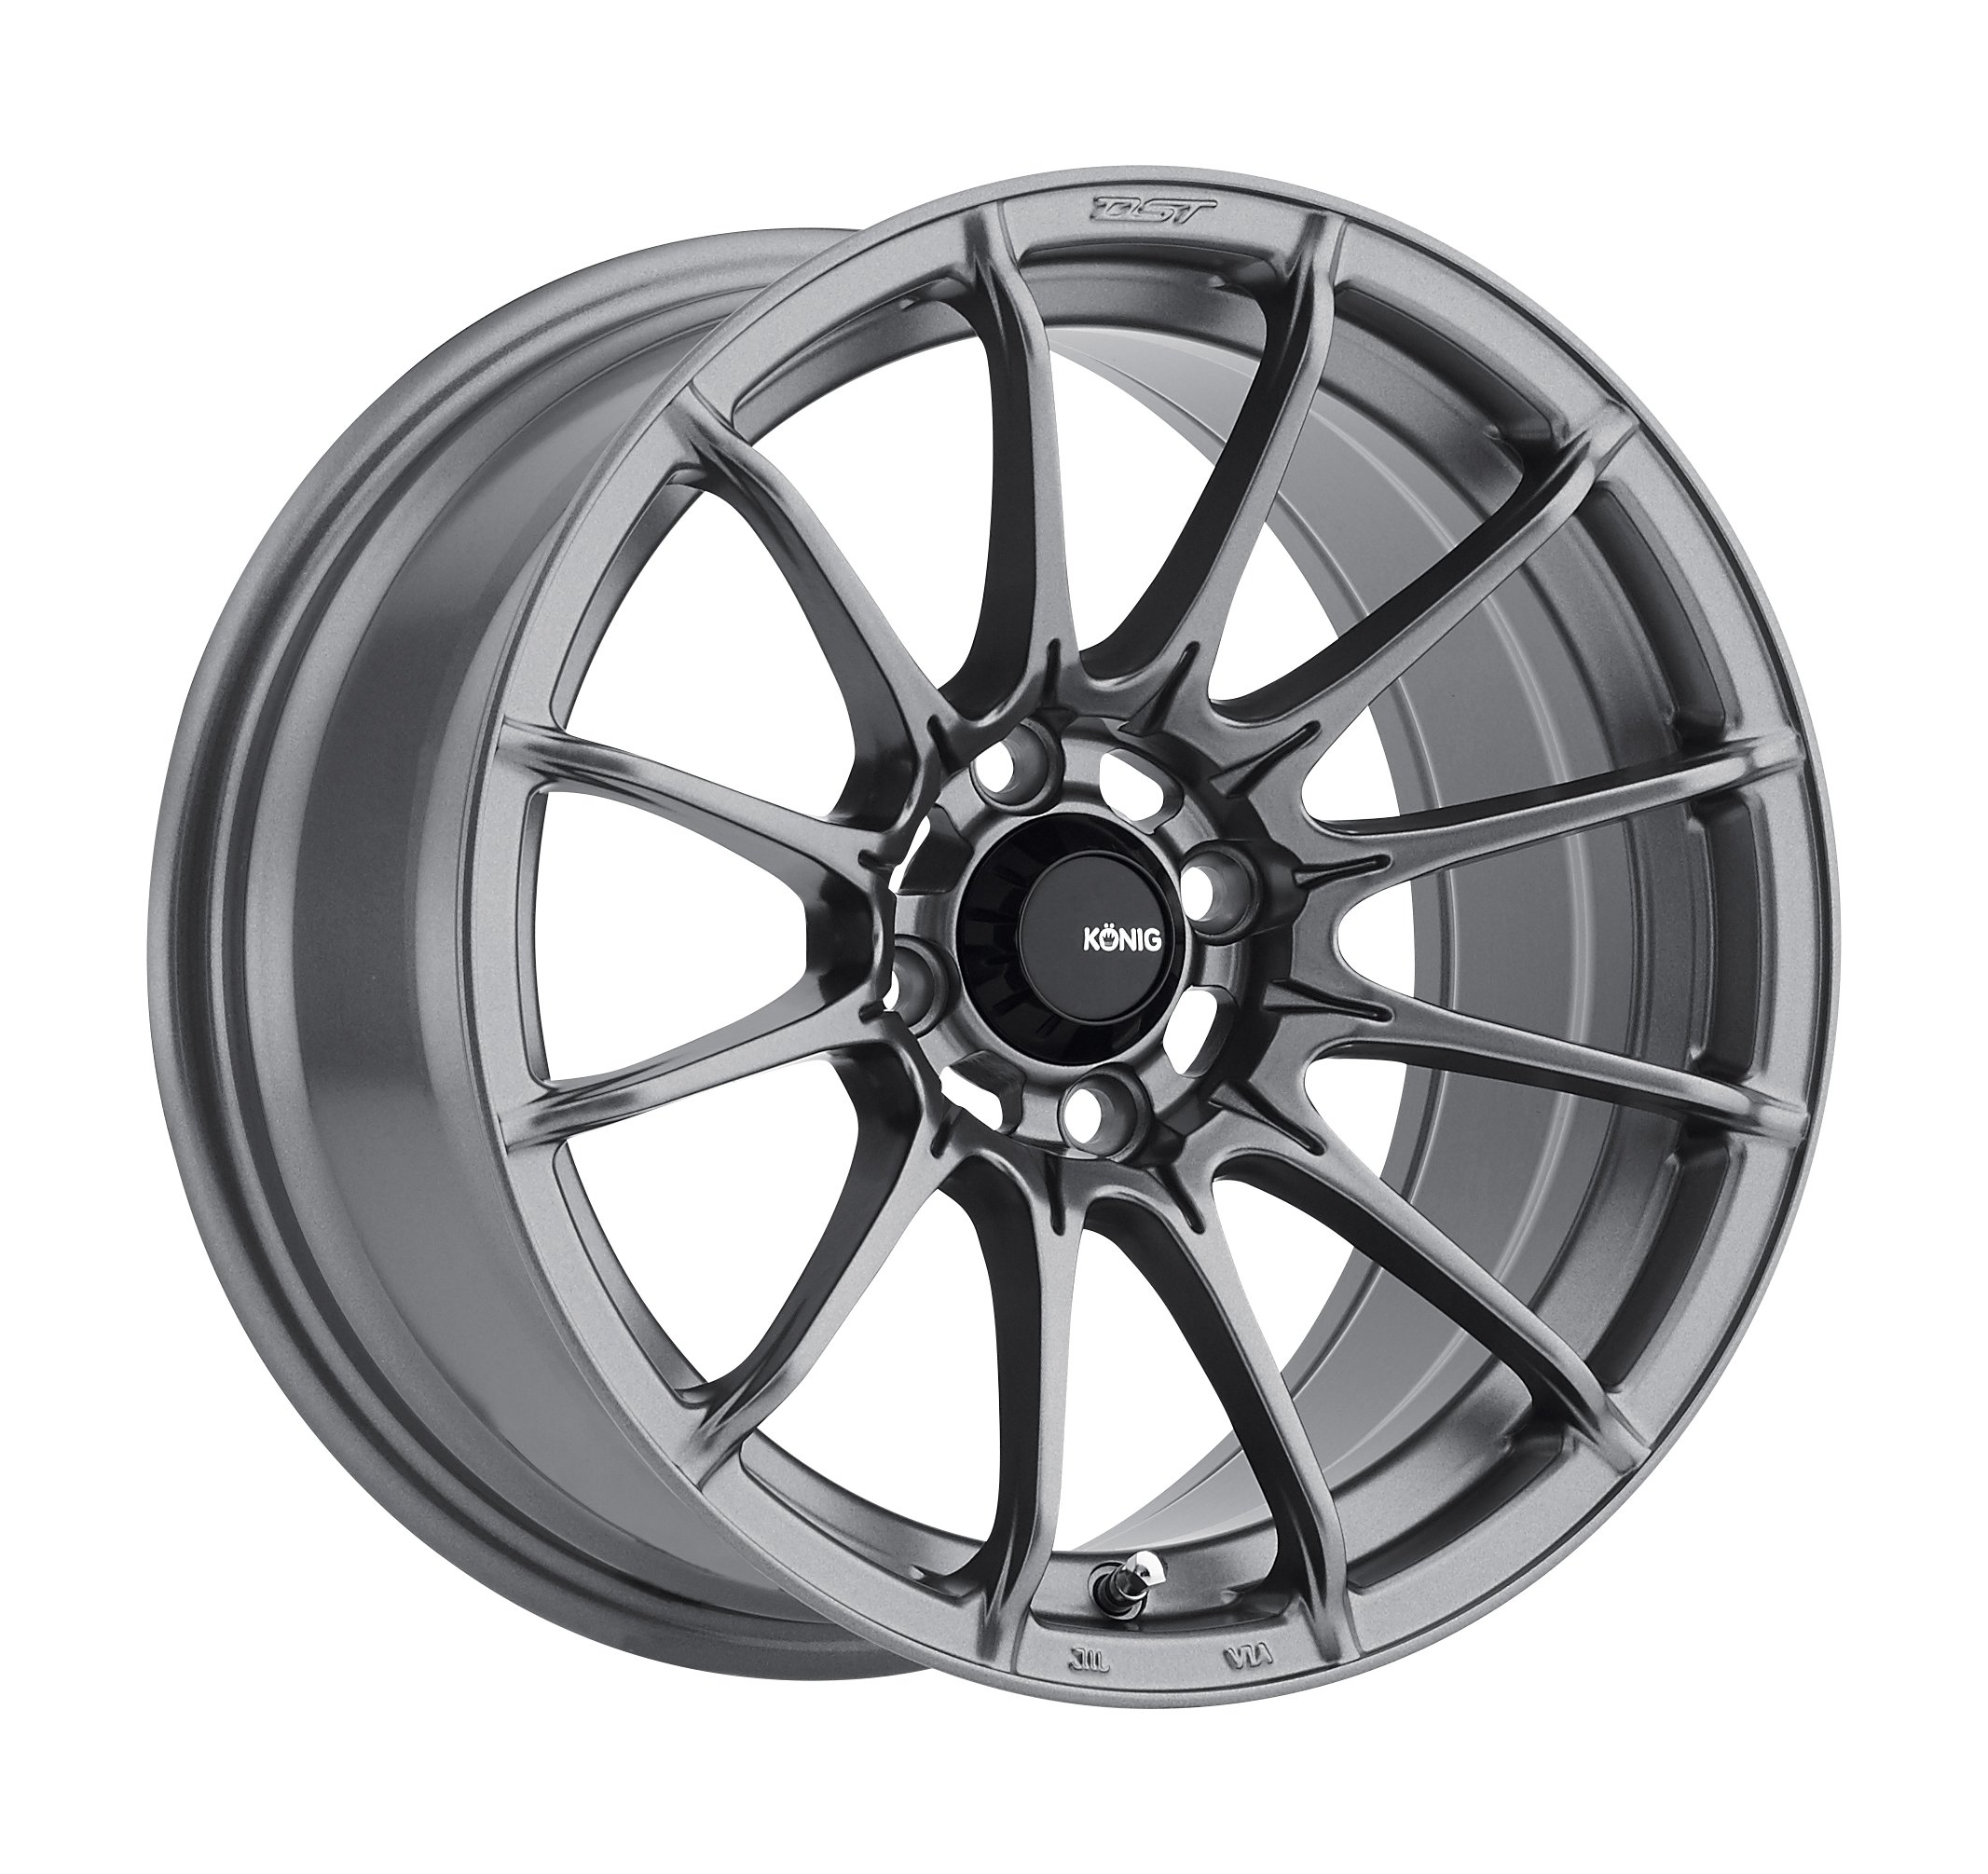 Konig-DIAL-IN-Matte-Grey-Wheel-15x74x100mm-35mm-offset